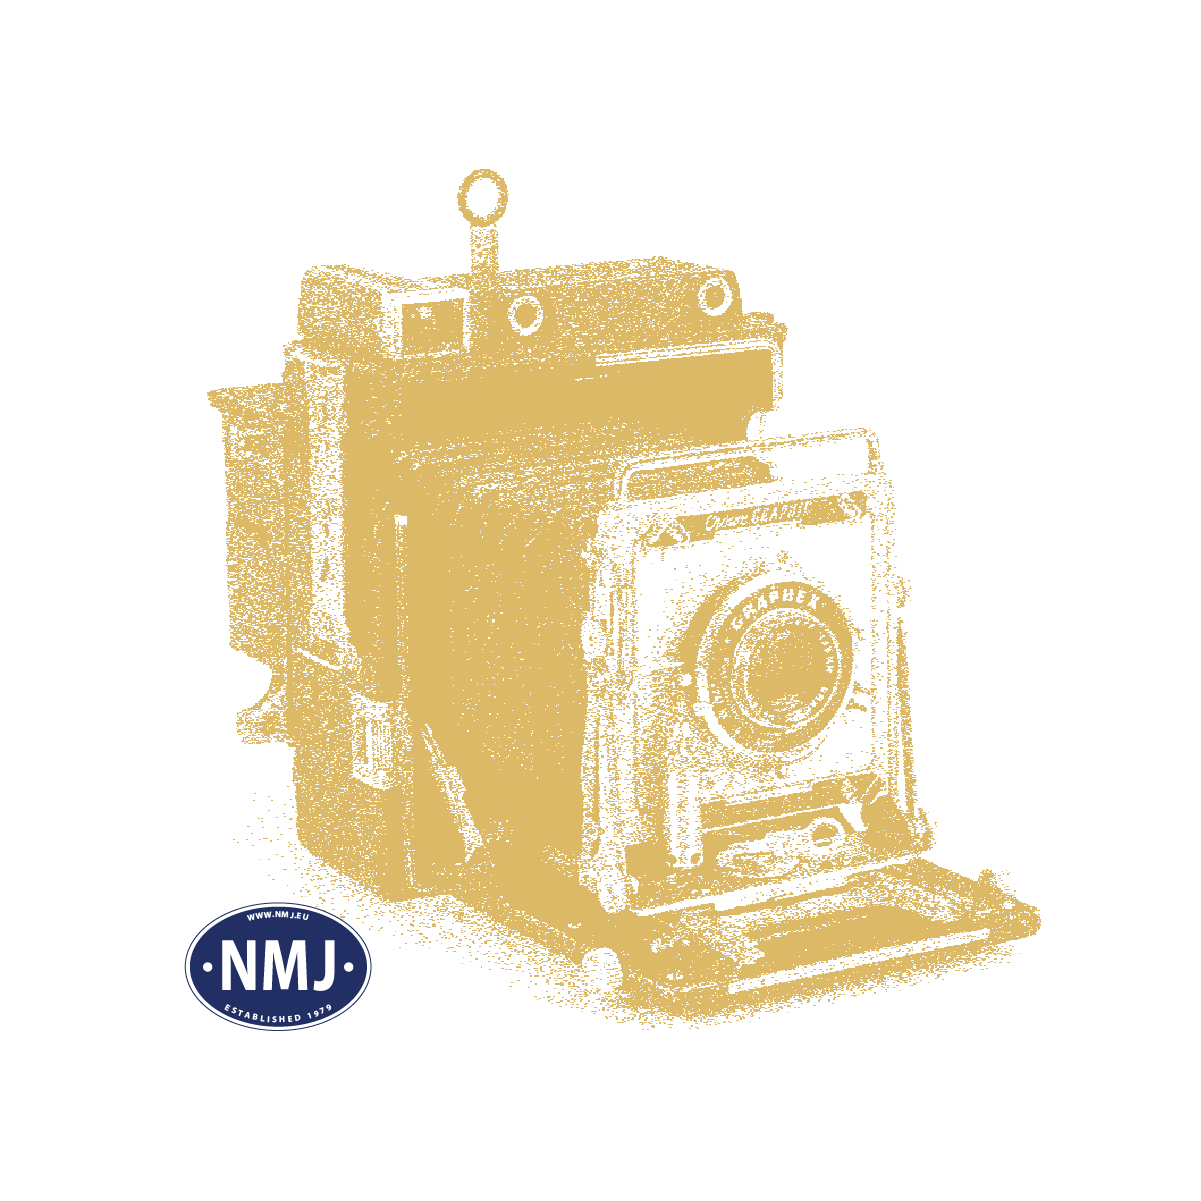 NMJT134.301 - NMJ Topline NSB DF37 21307, New design